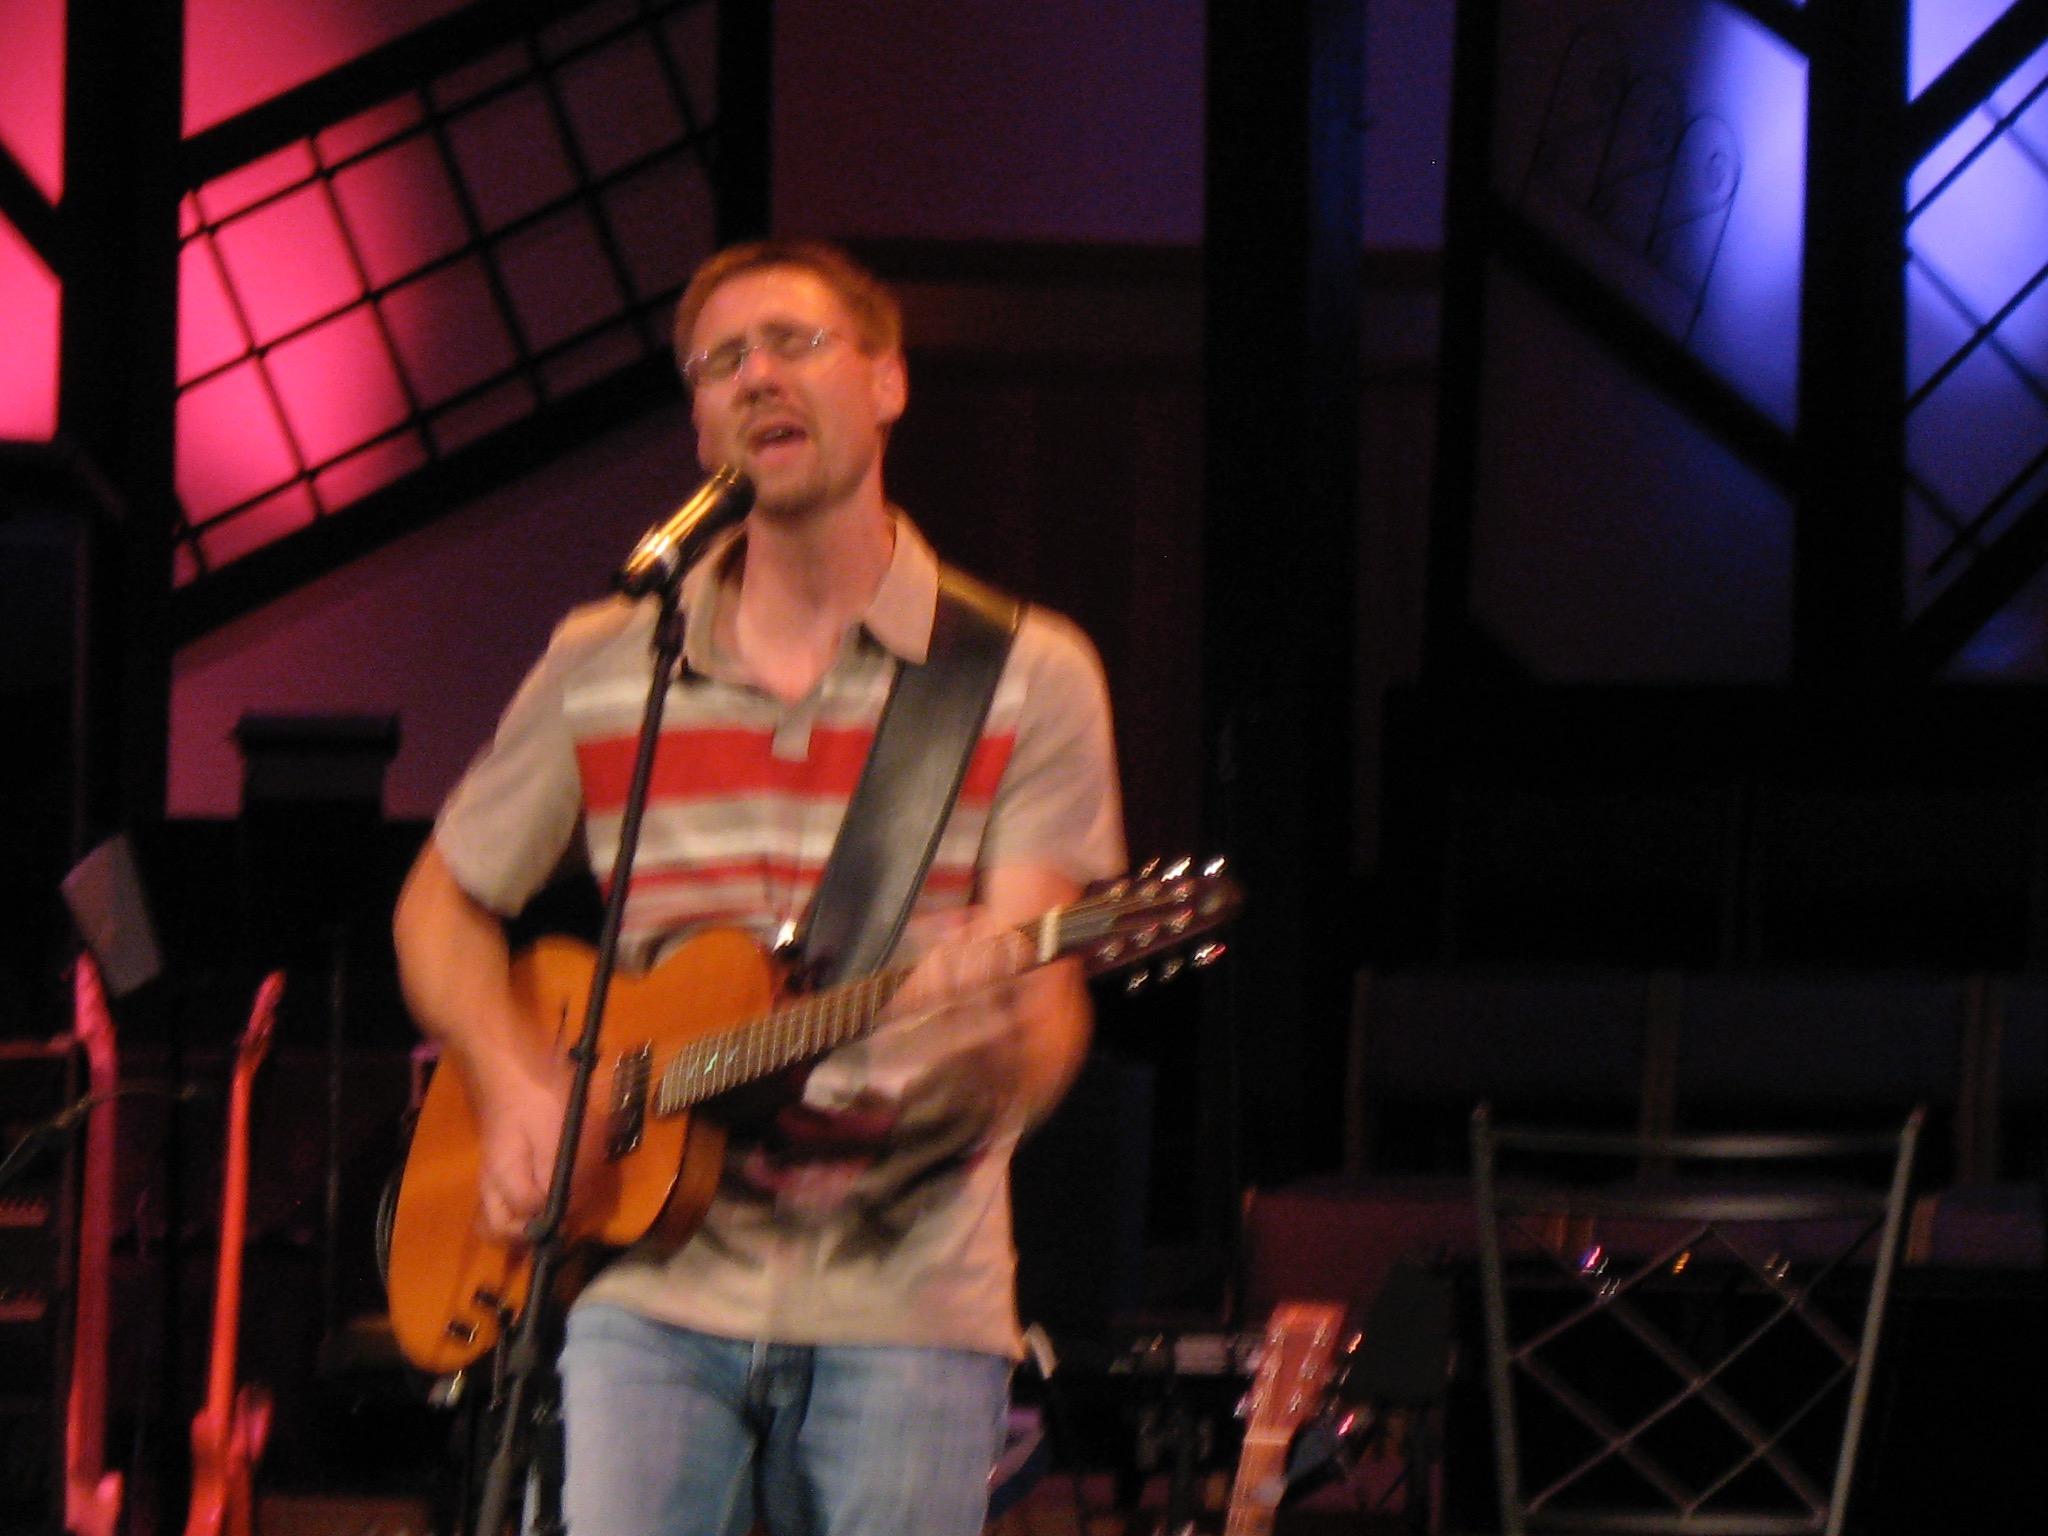 Dan Ryker at song writing contest